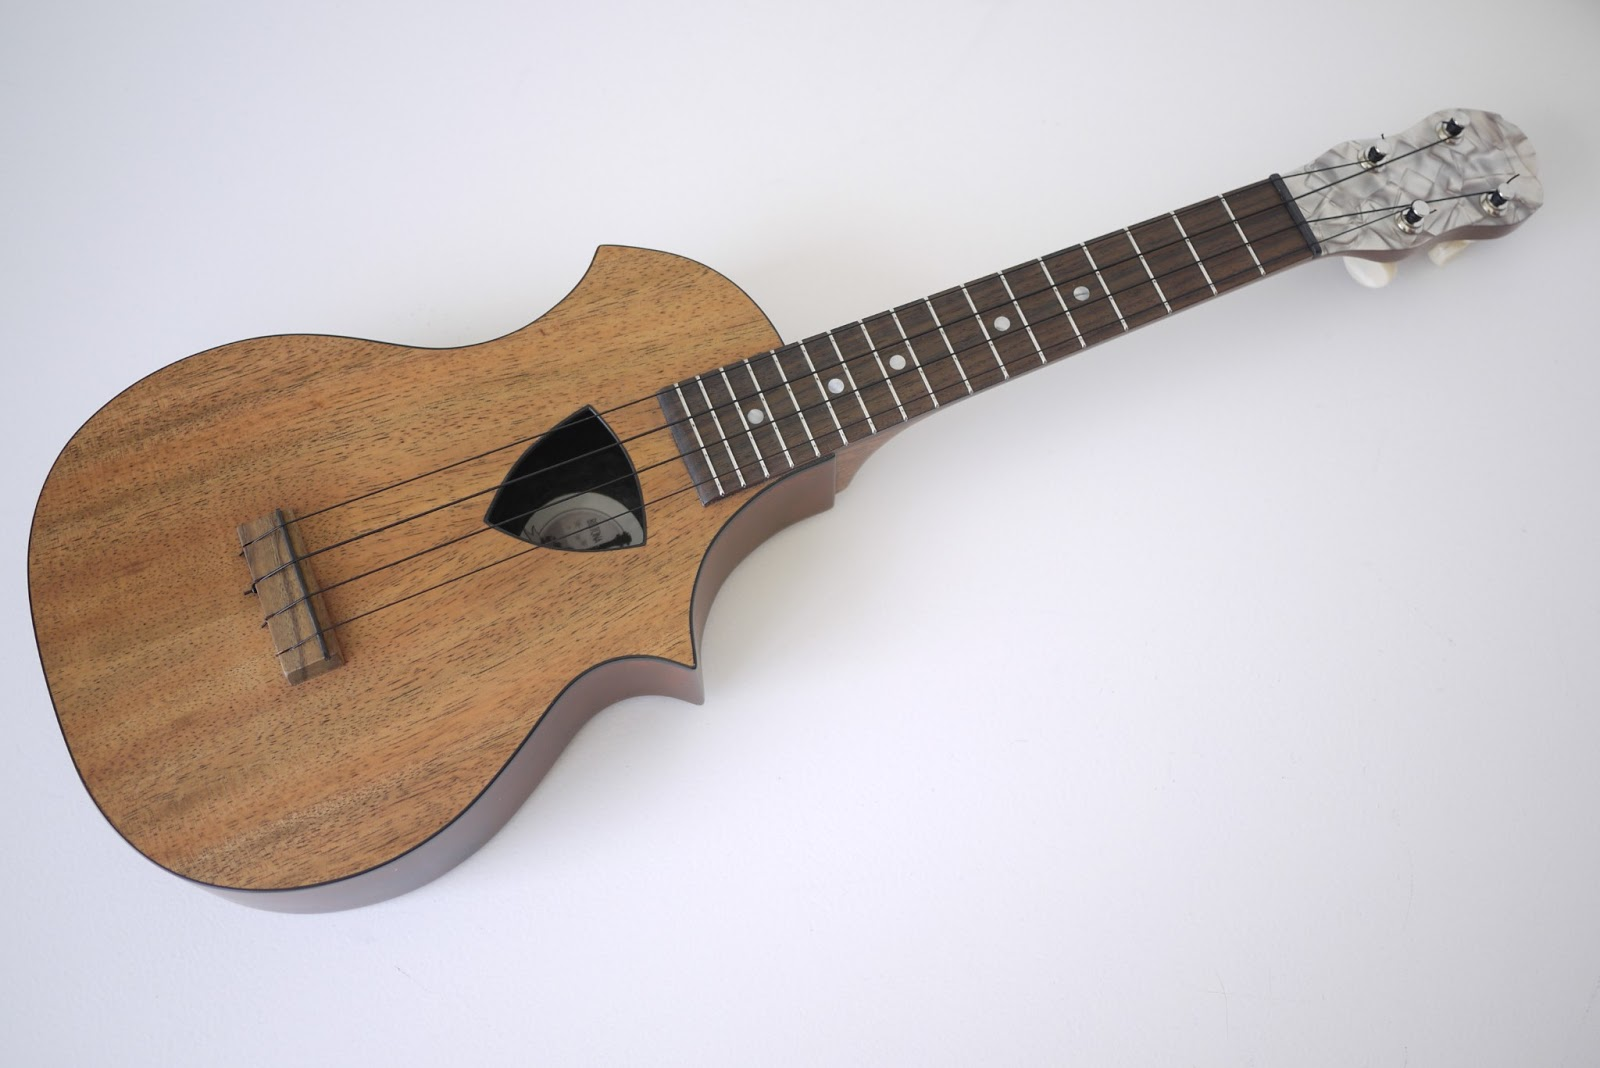 Custom Devine Concert Ukulele Built In Lahaina Maui